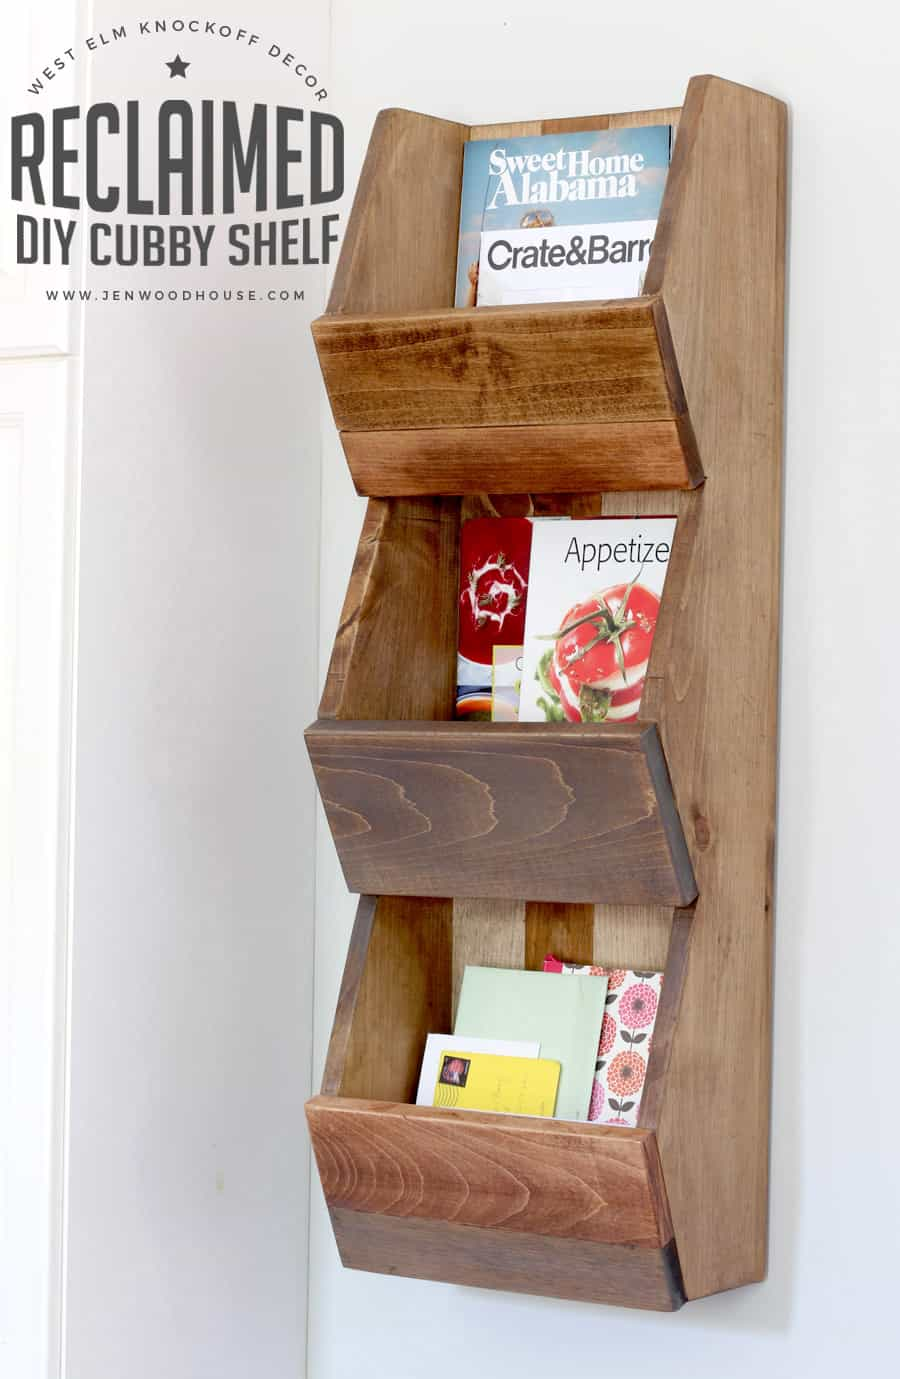 Reclaimed wood DIY cubby shelf